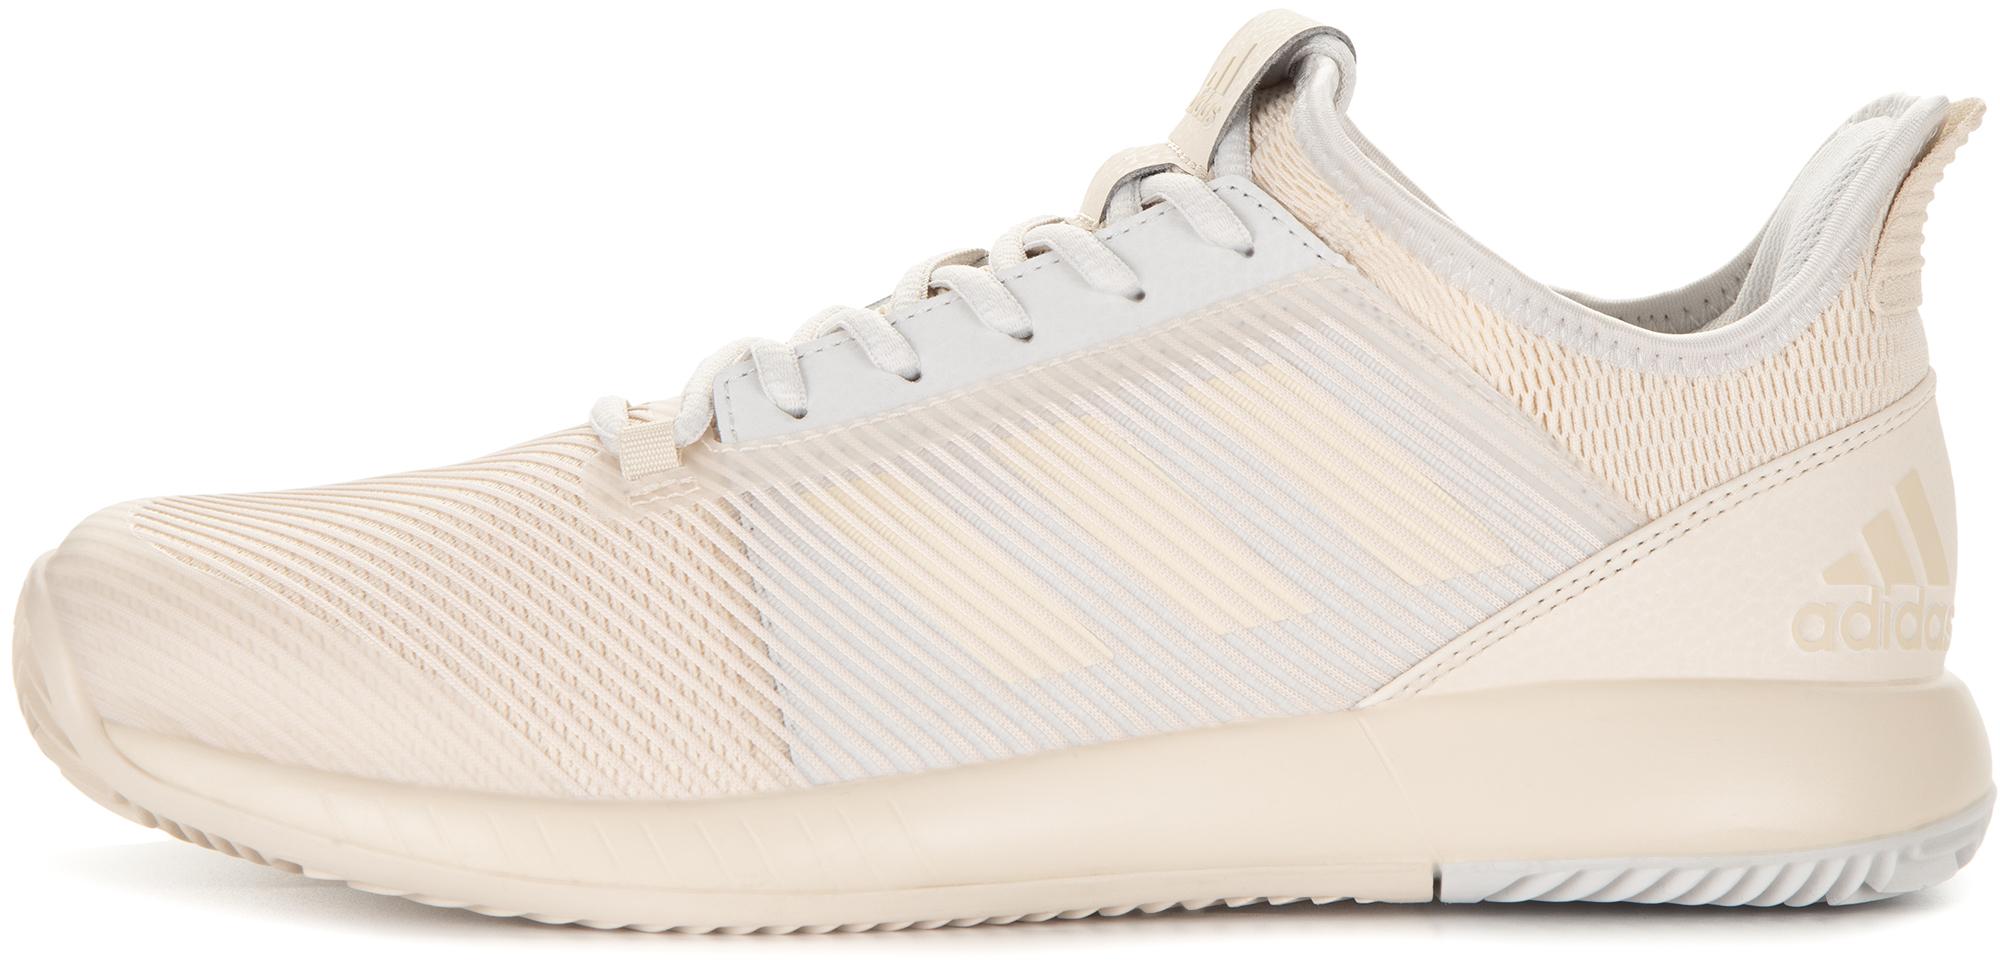 Adidas Кроссовки женские Adidas Adizero Defiant, размер 42,5